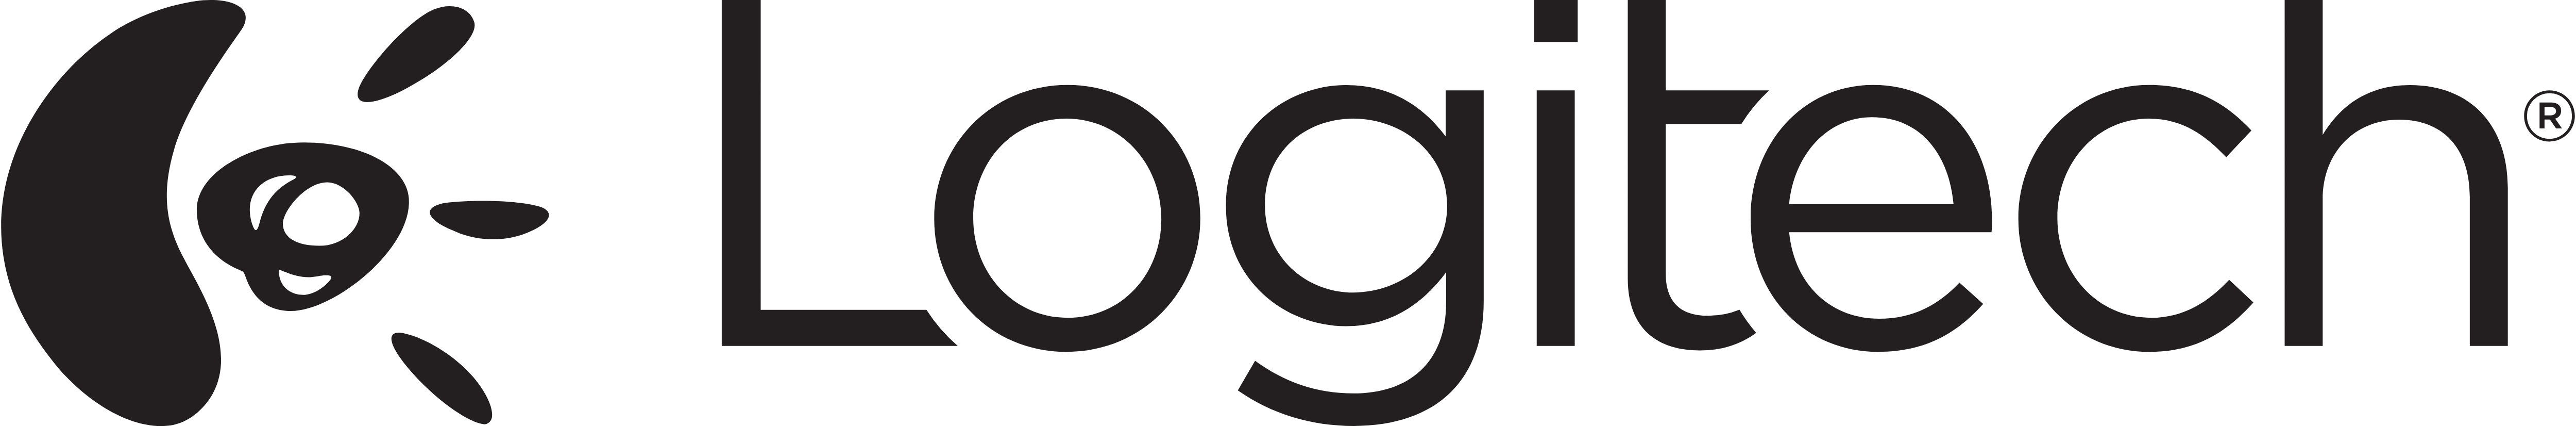 Image Result For Logitech Gaming Logo